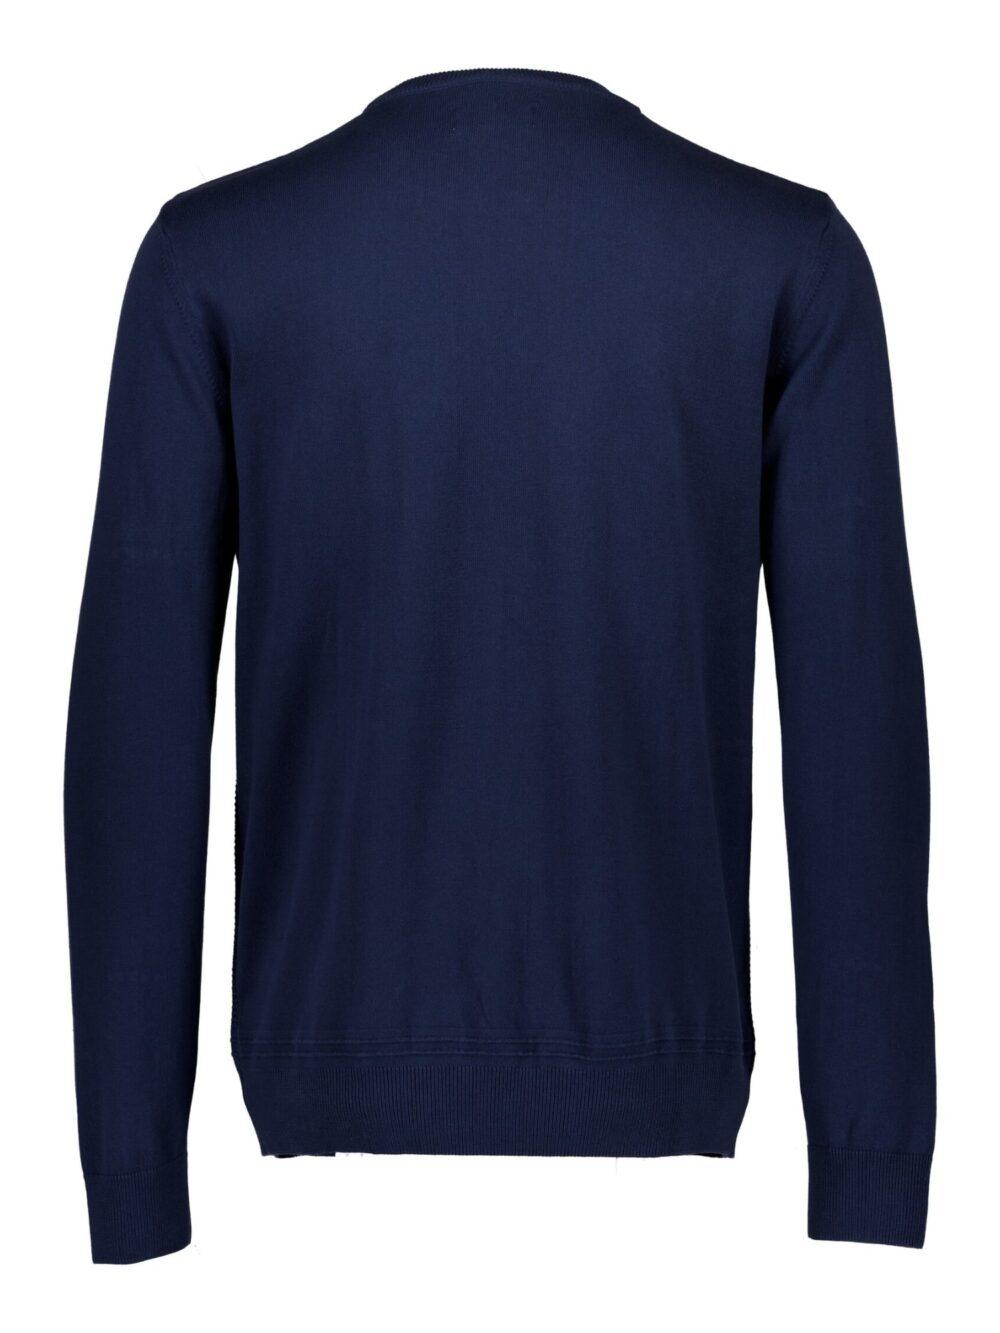 Bison Pullover 80-800002 DK NAVY